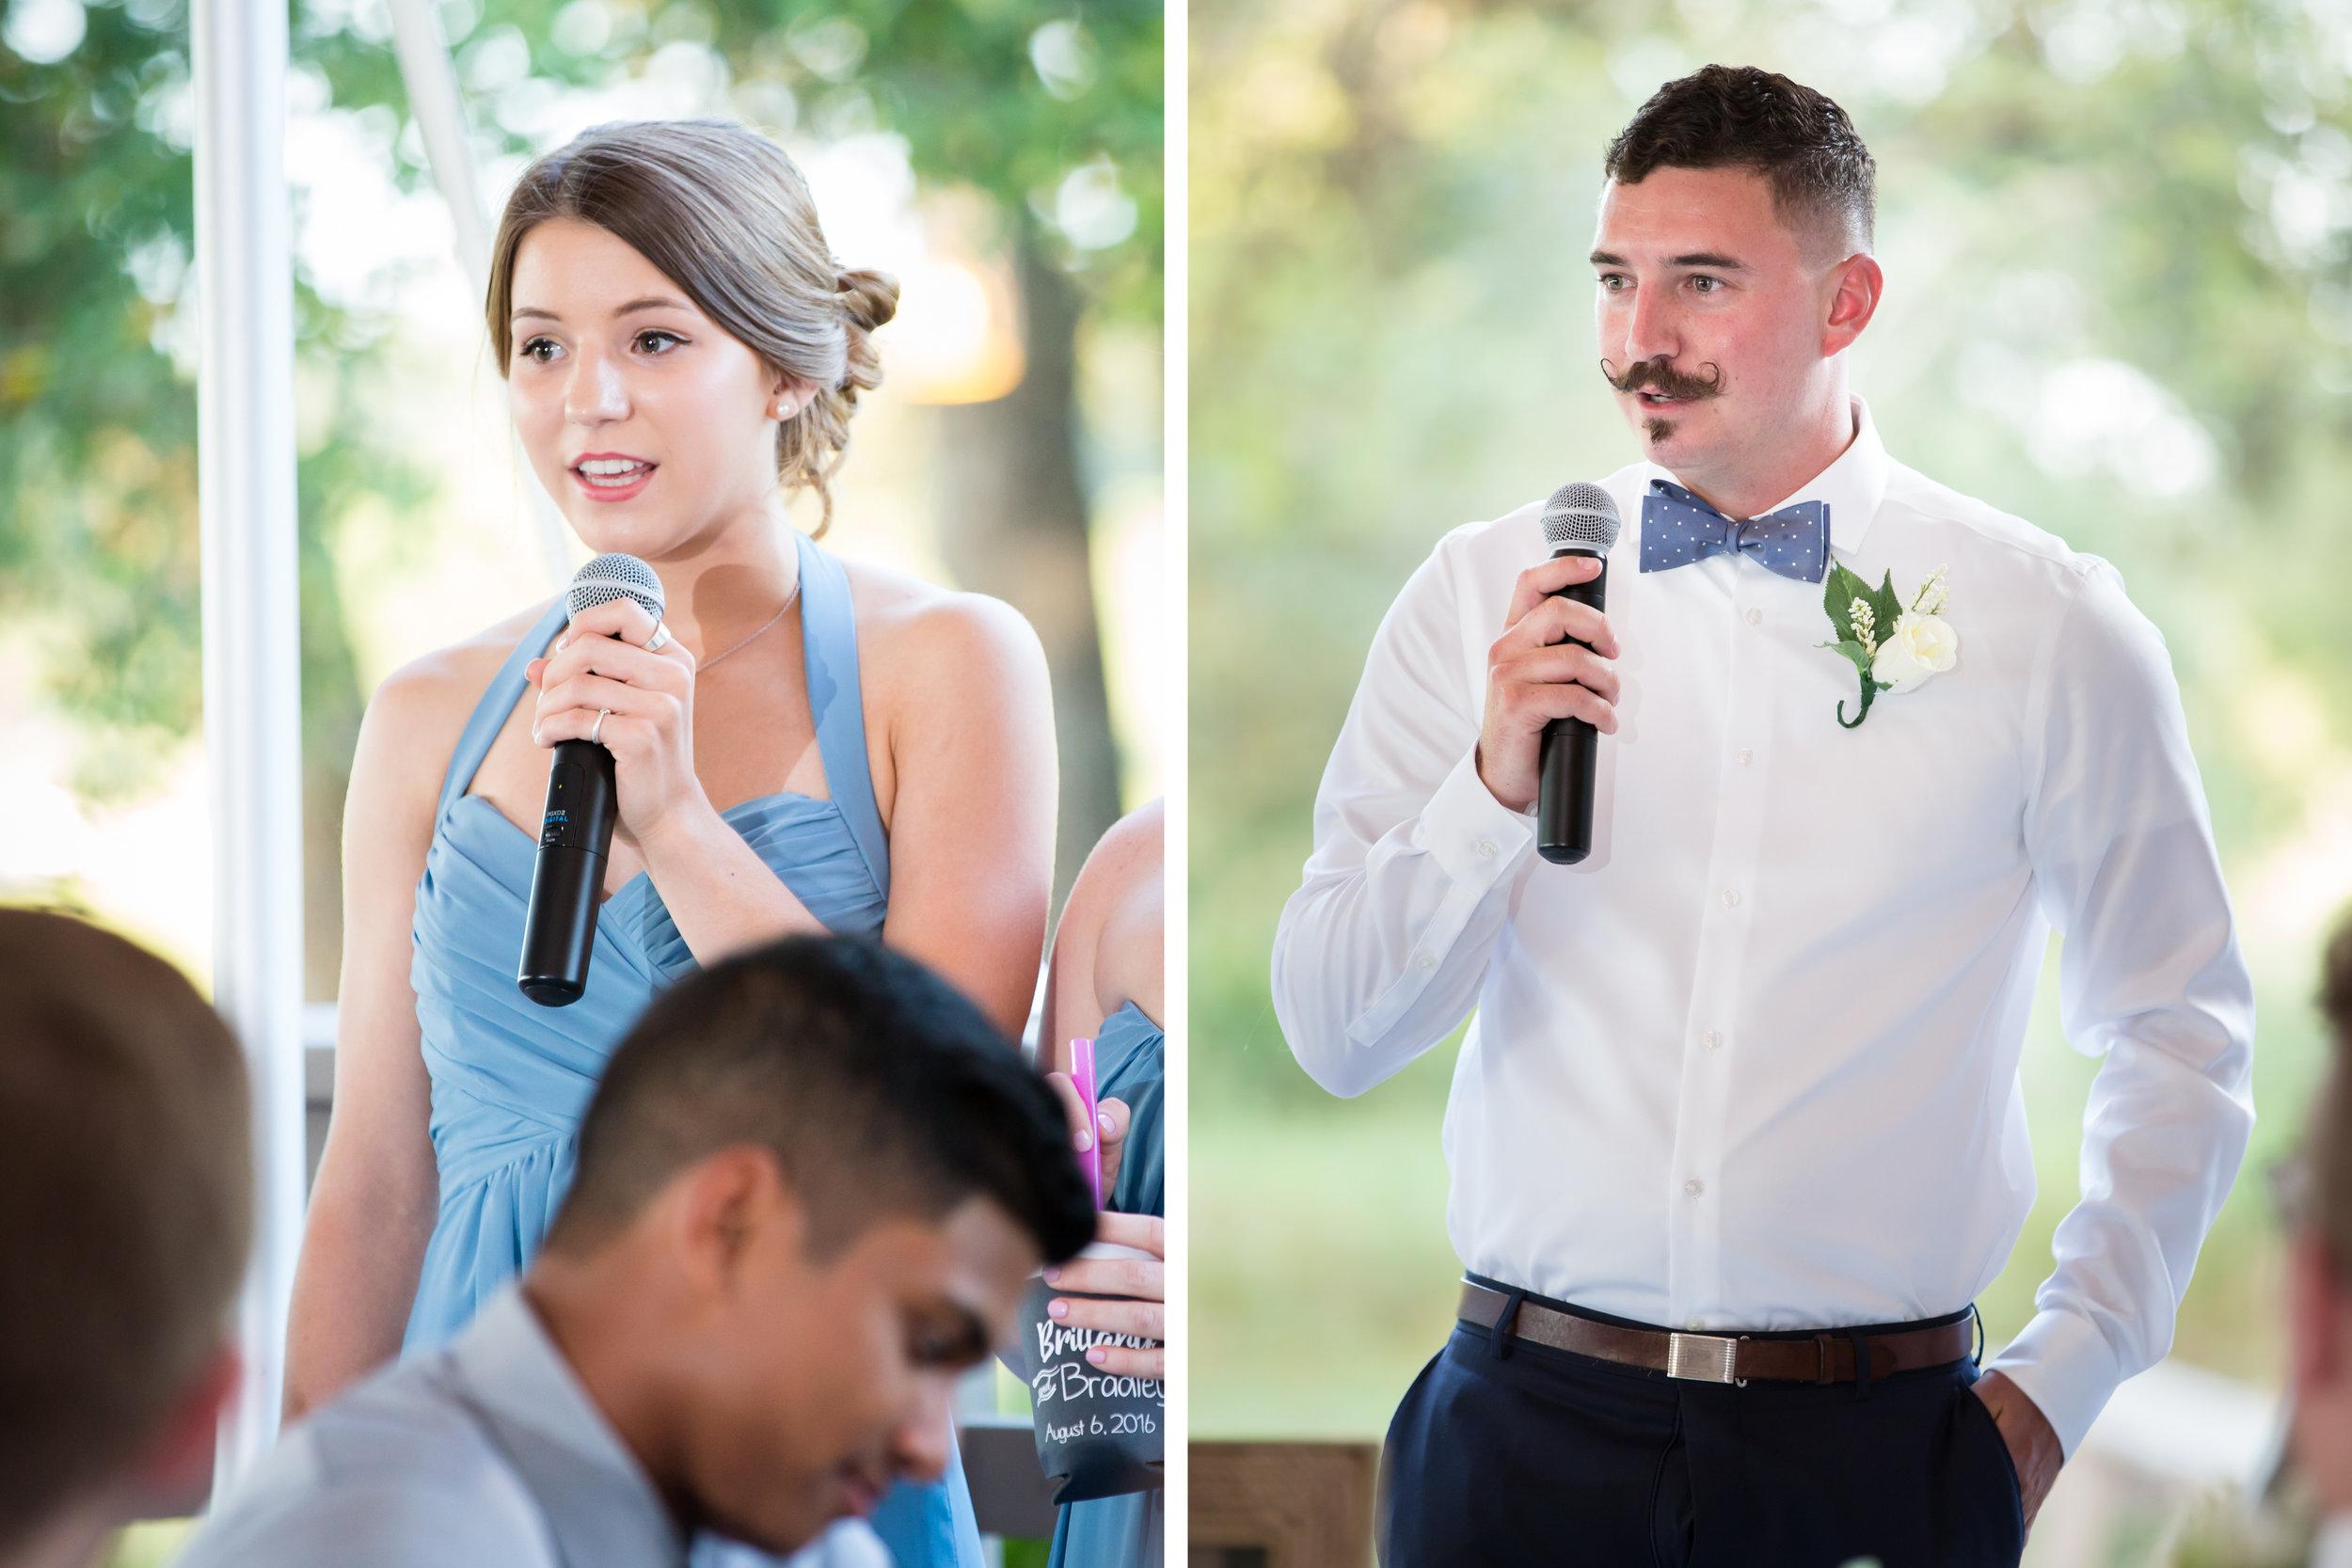 austin-wedding-photo-and-video-team.jpg